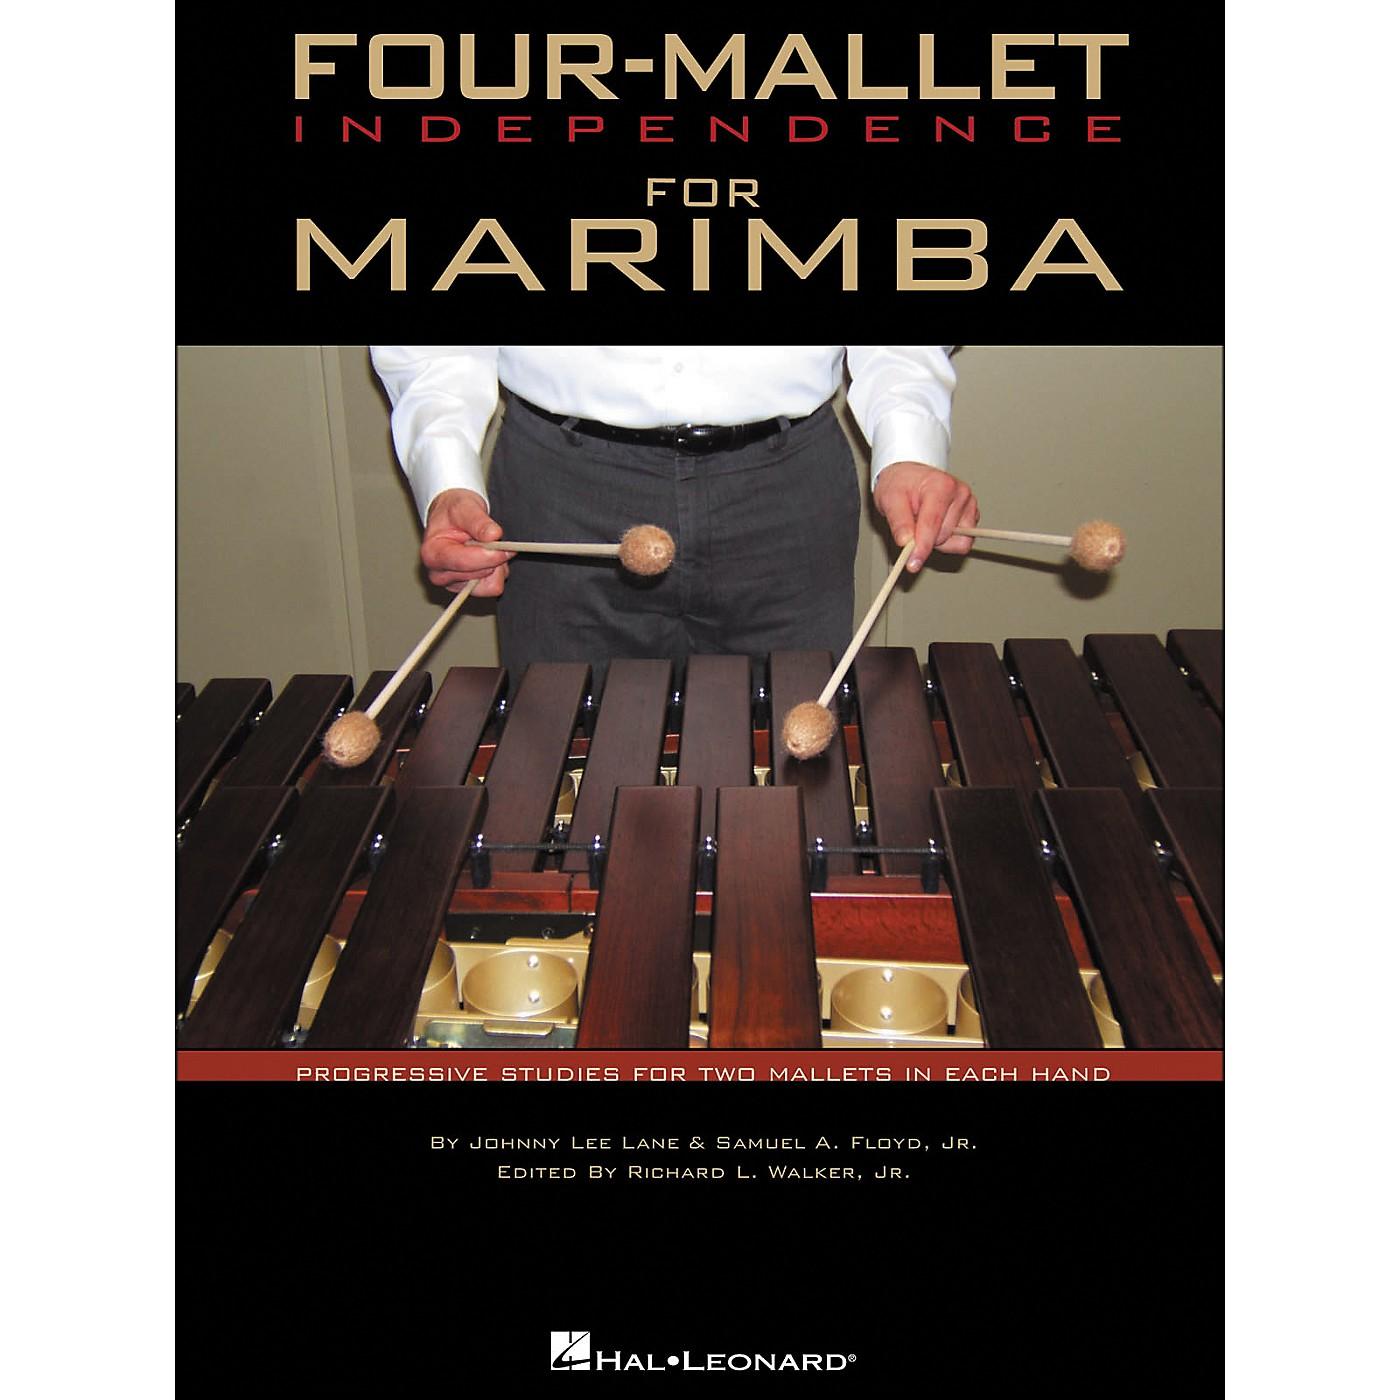 Hal Leonard Four Mallet Independence for Marimba thumbnail